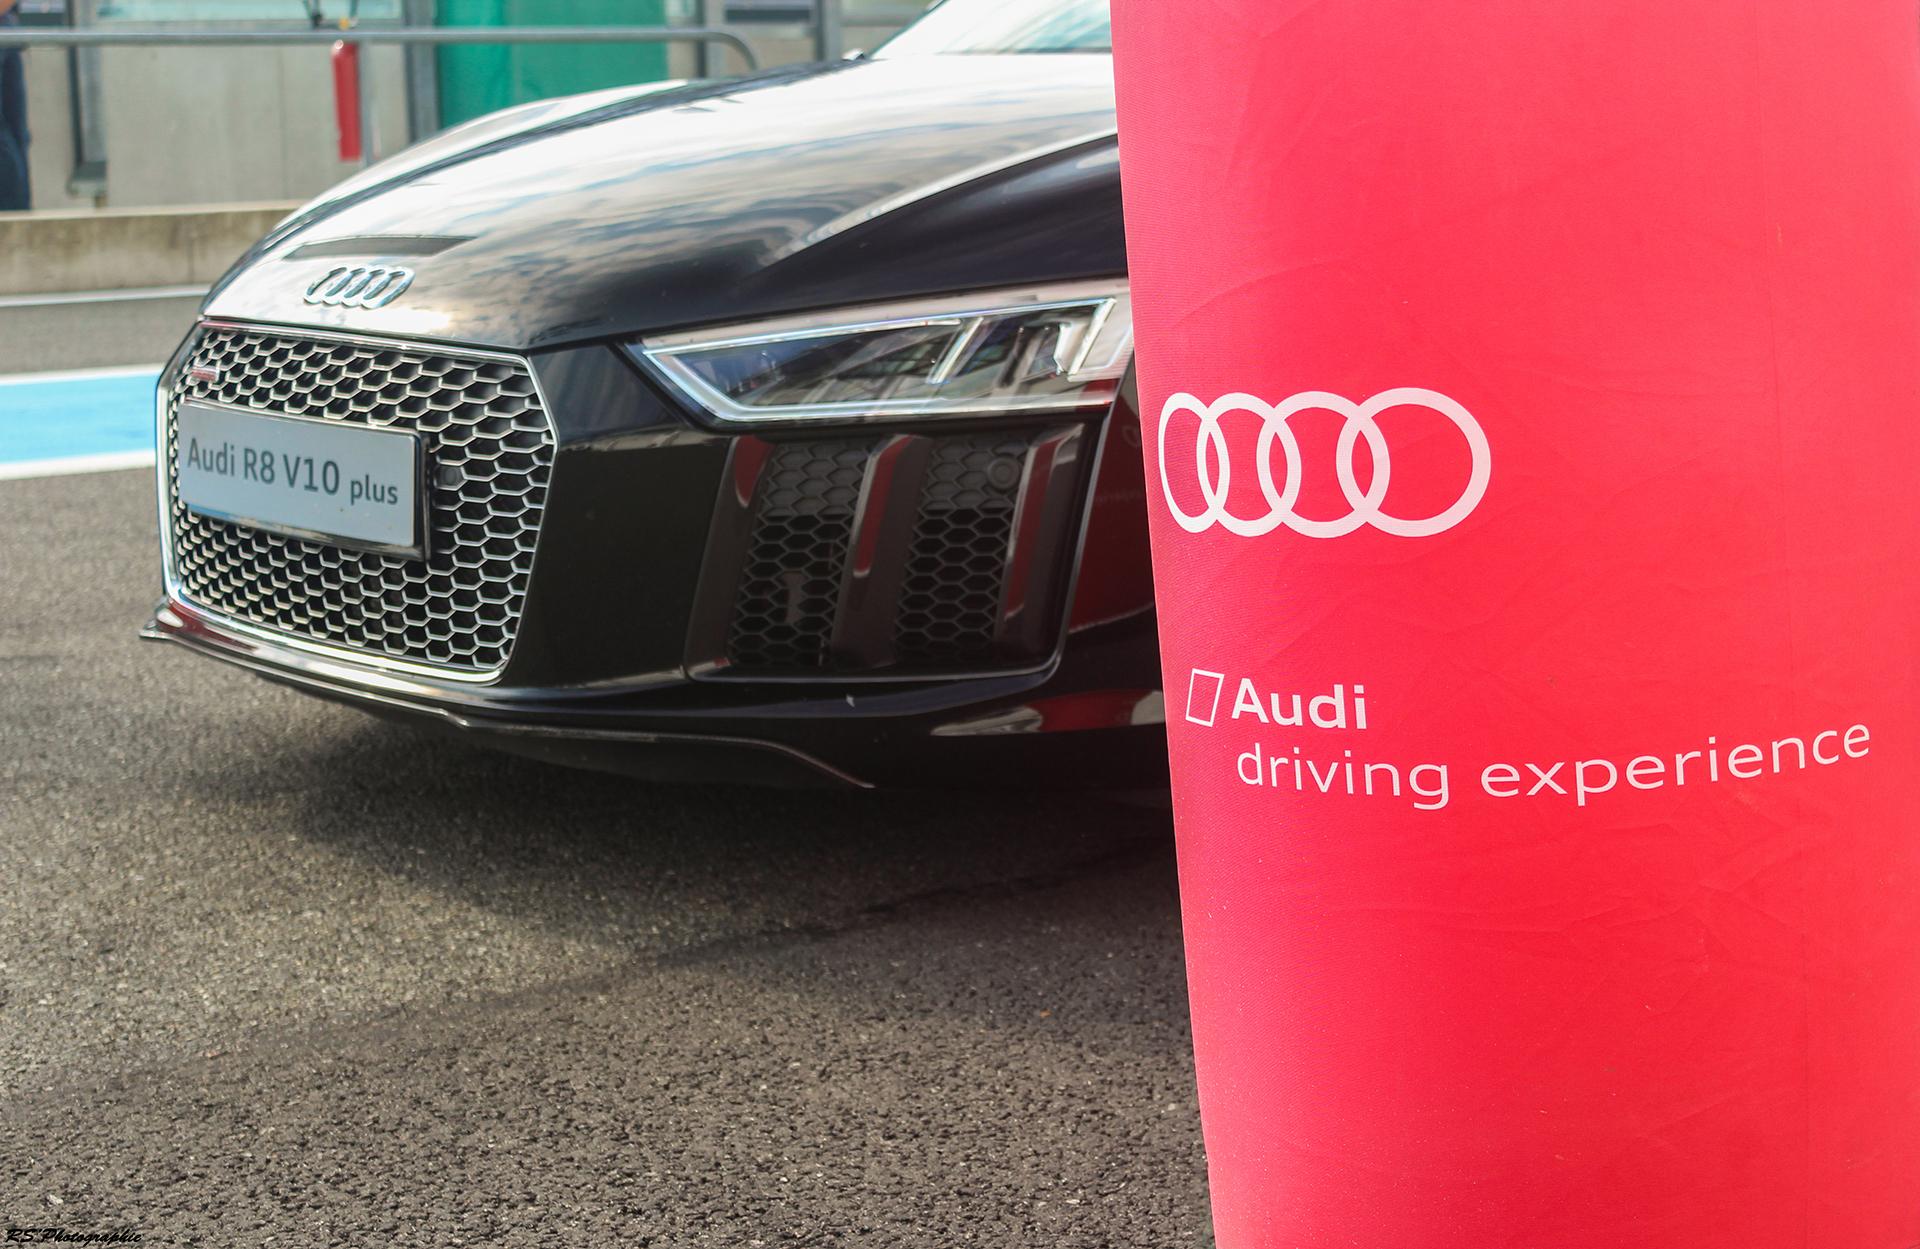 Audi R8 V10 Plus - face avant / front face - photo Arnaud Demasier